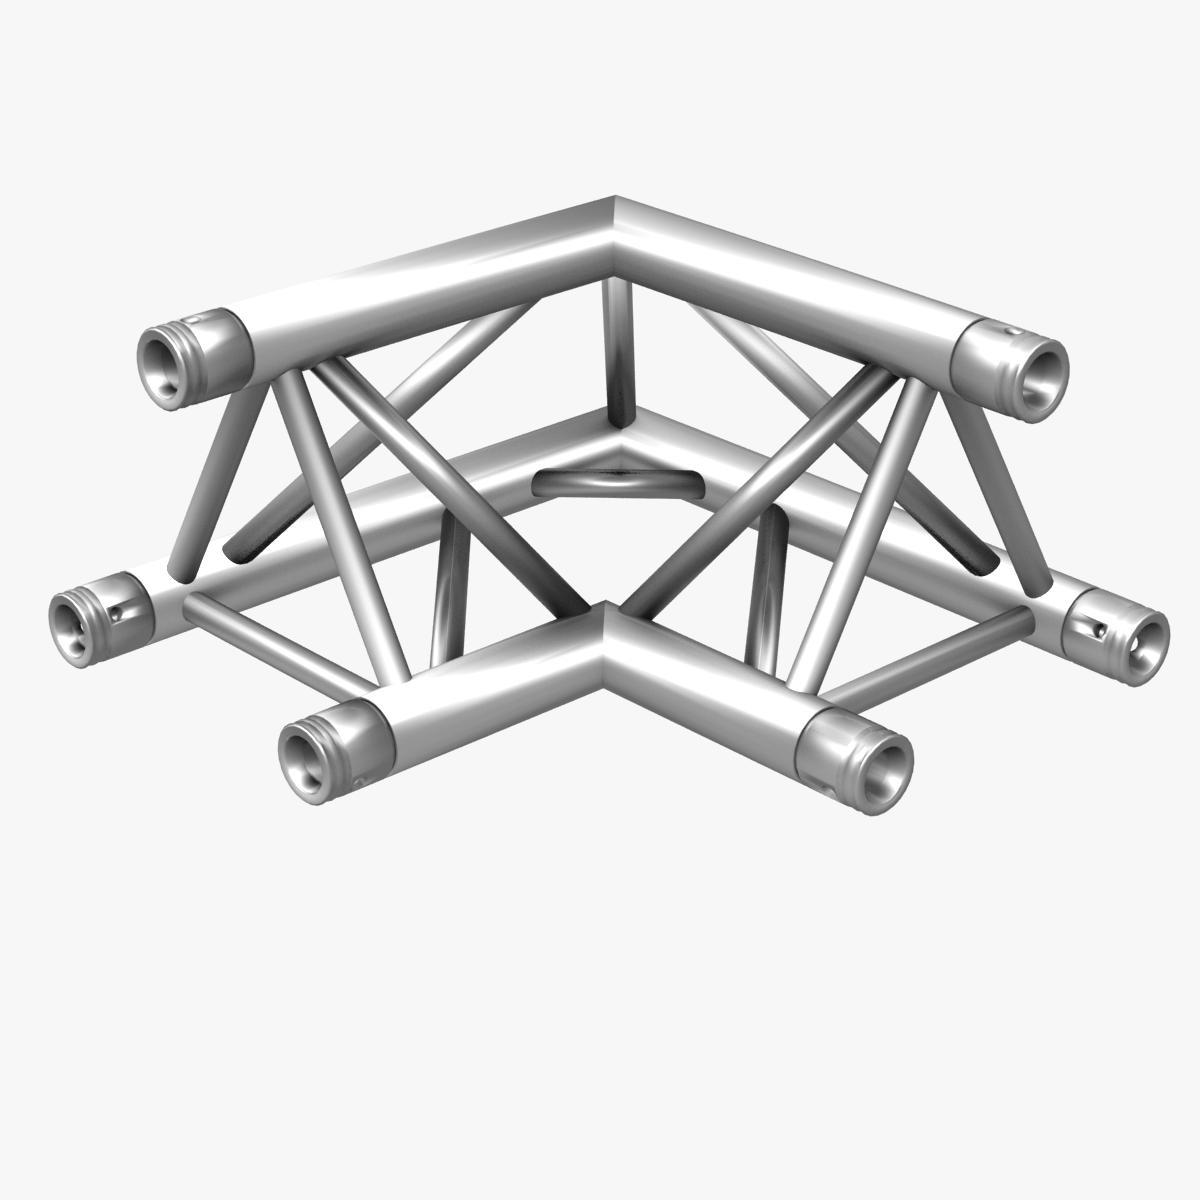 triangular trusses (collection 55 modular pieces) 3d model 3ds max dxf fbx c4d dae texture obj 216234